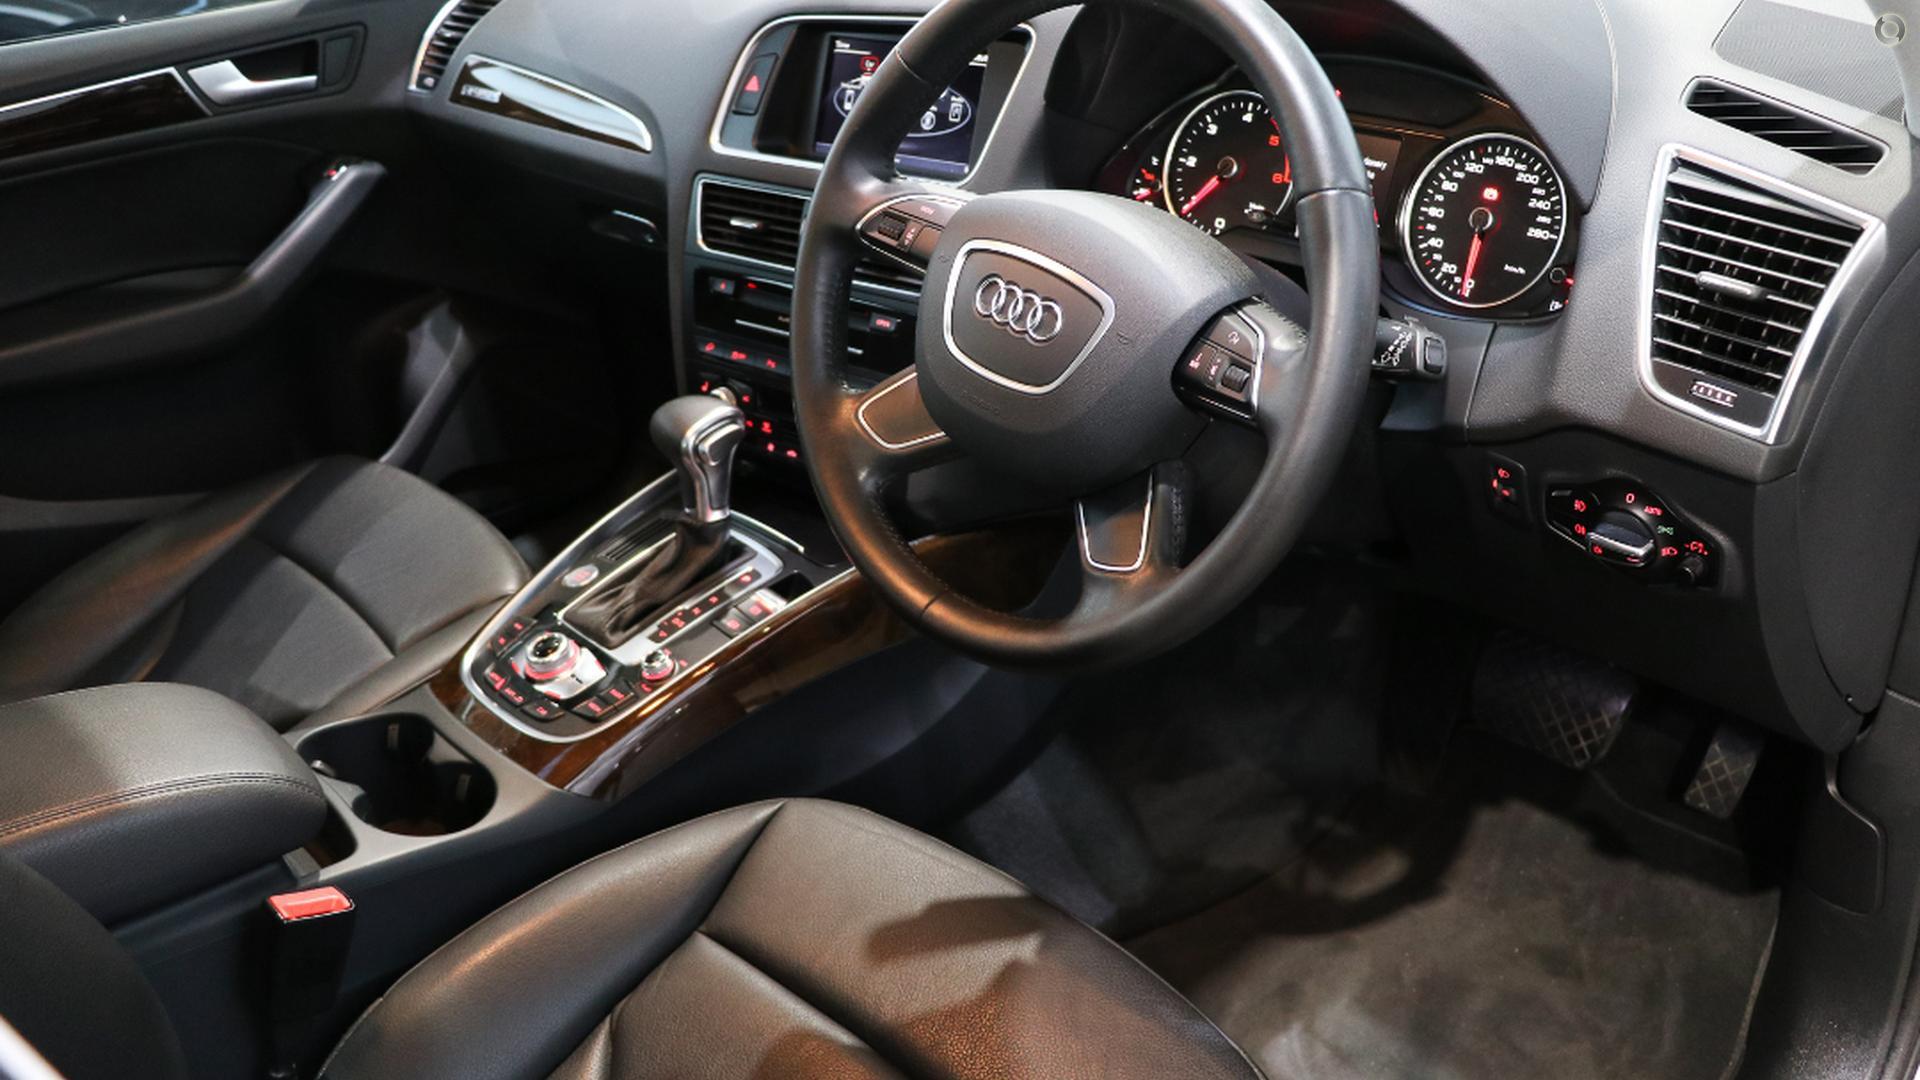 2013 Audi Q5 TDI 8R